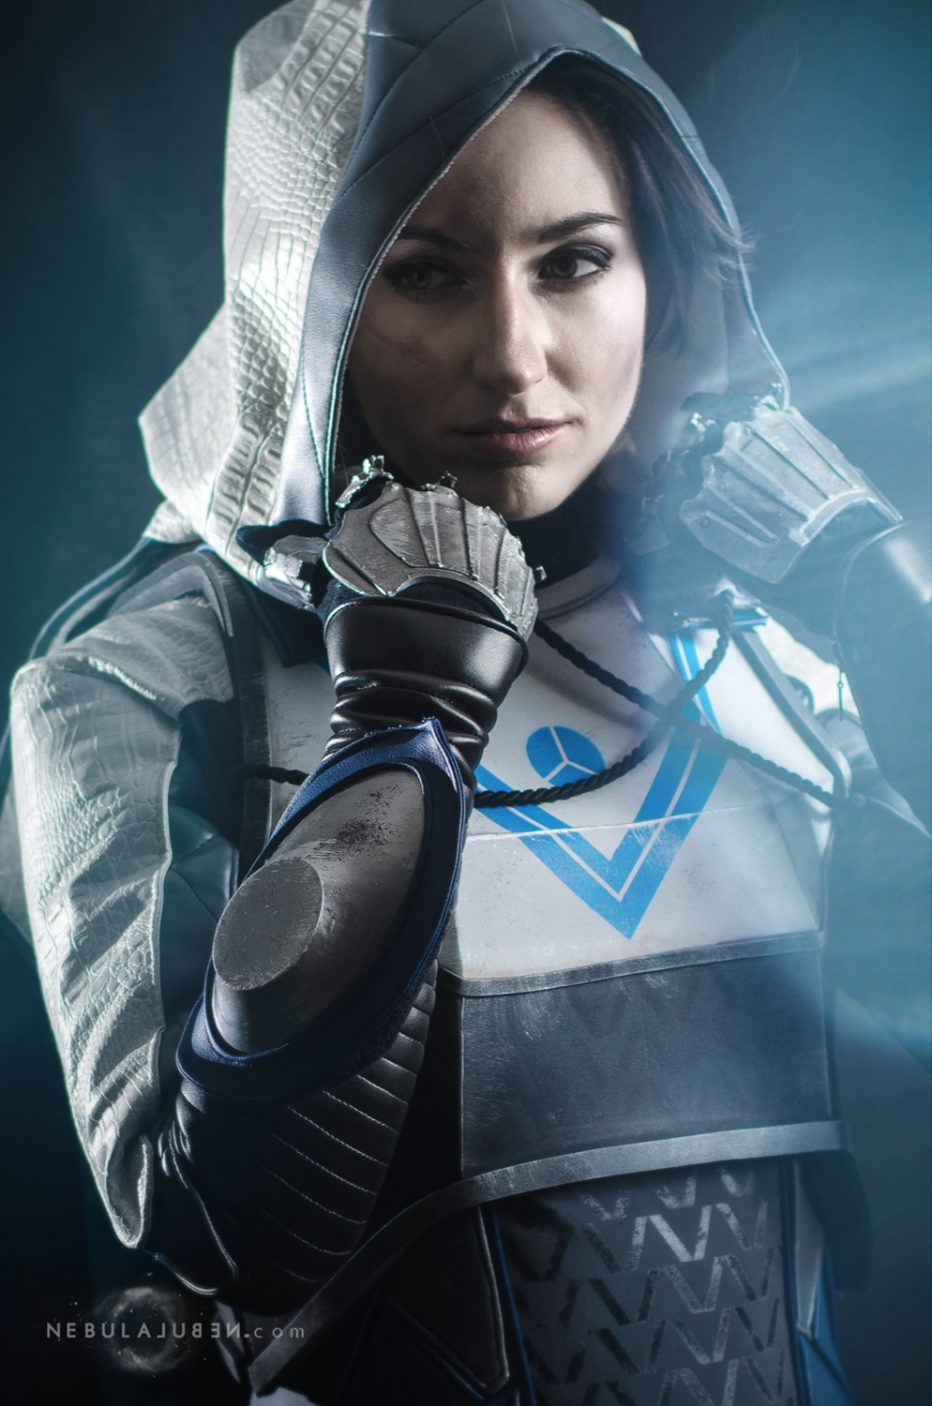 Destiny-2-Huntress-Cosplay-Gamers-Heroes-1.jpg